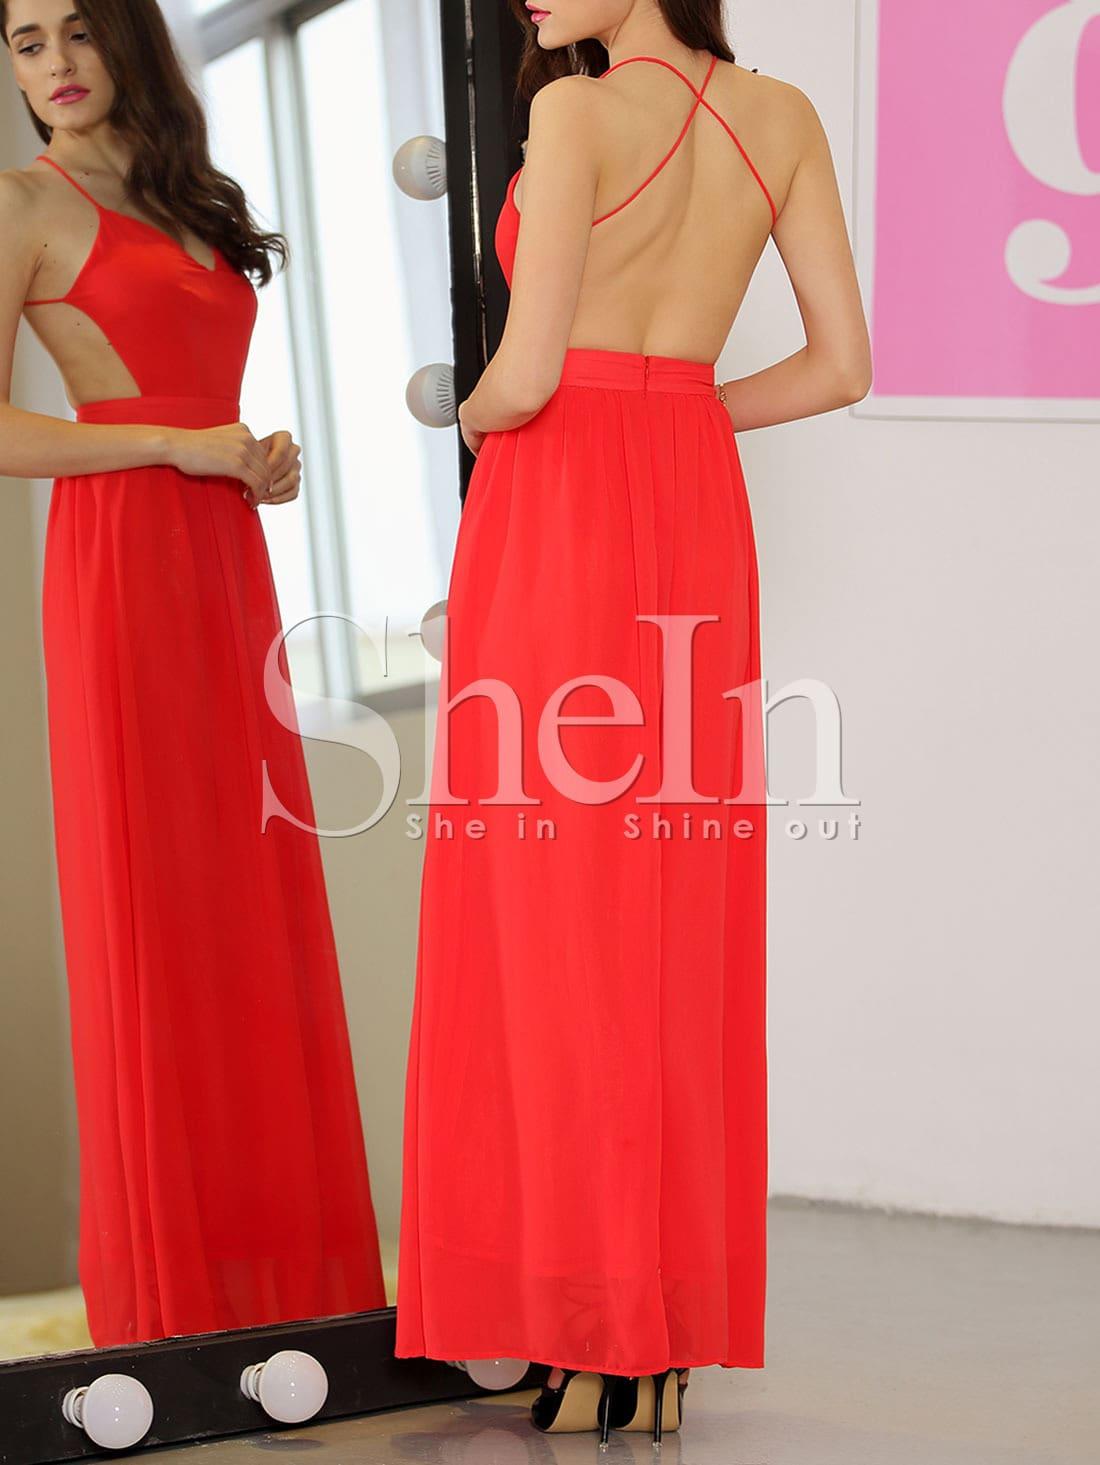 Shopping V-Neck Plain Maxi Dress sizes cute for juniors